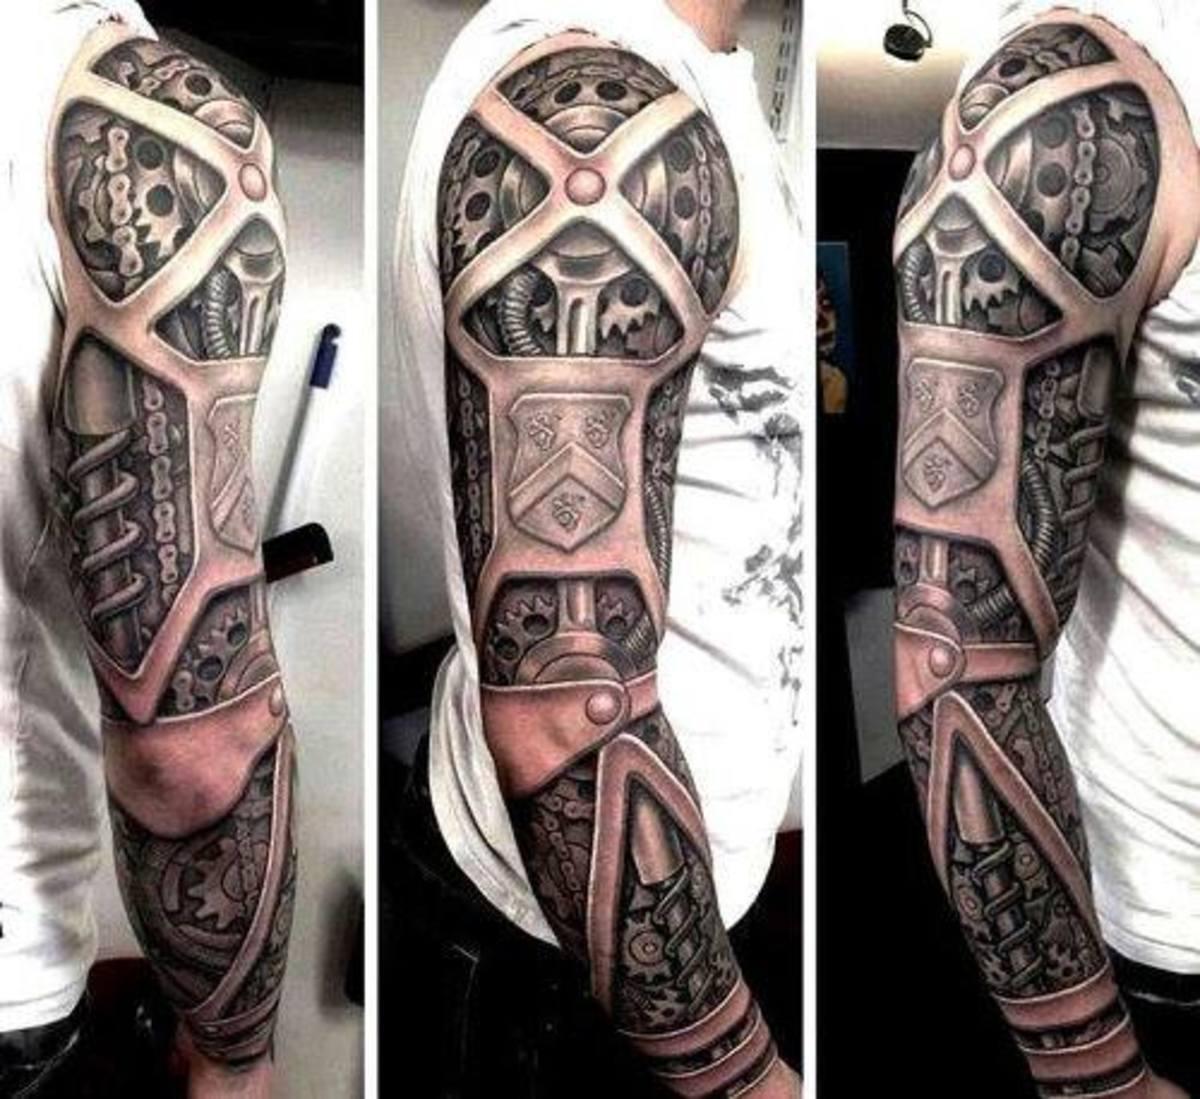 Biomechanic arm tattoo